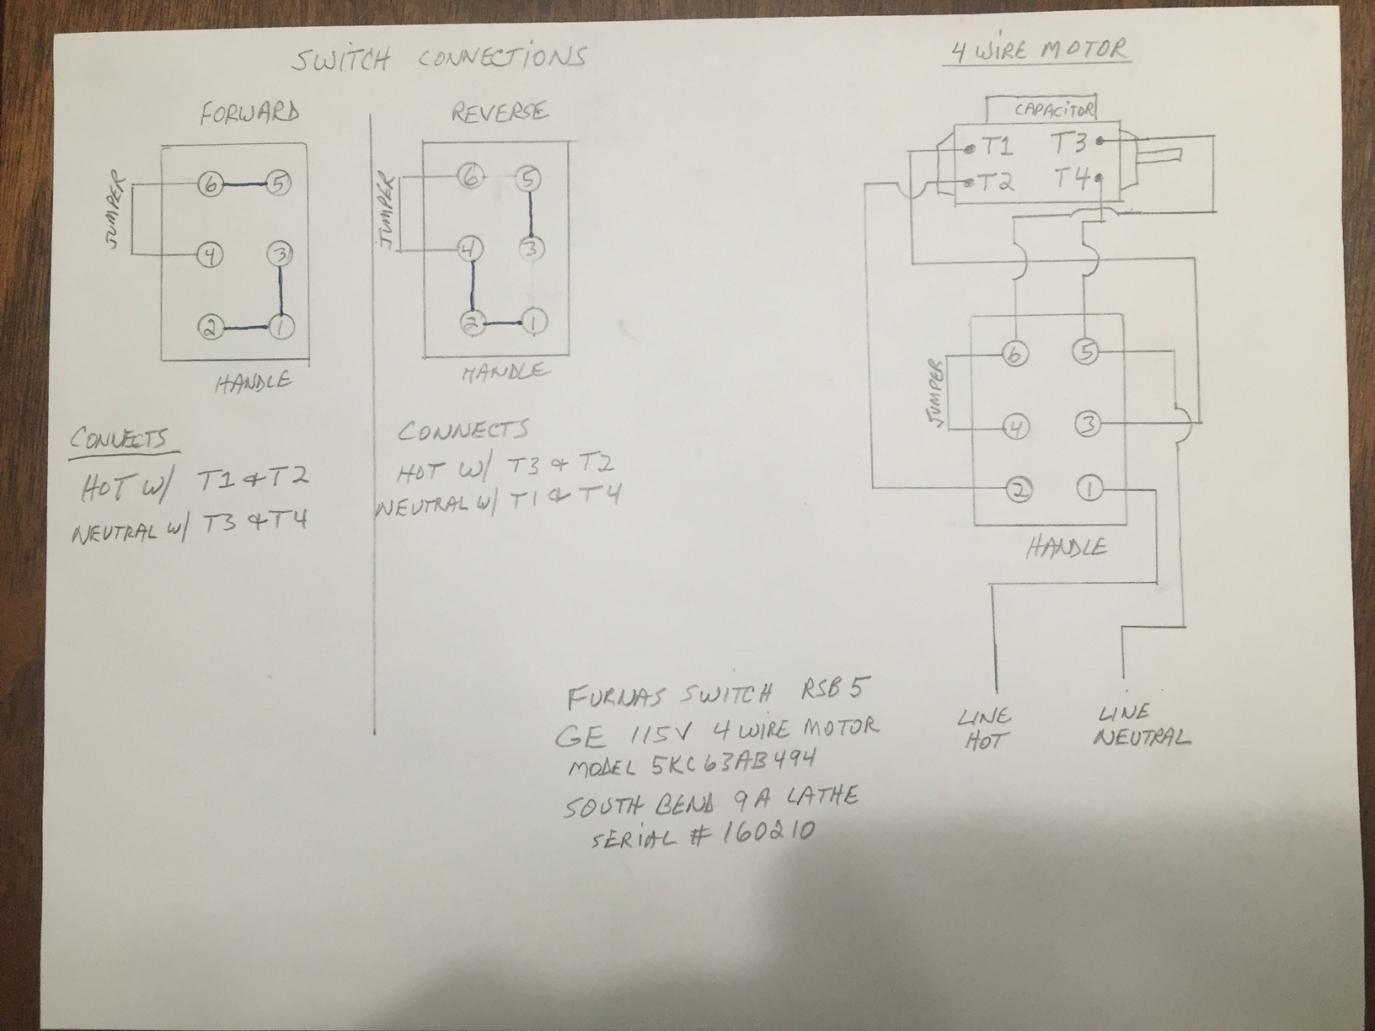 hight resolution of deltum inverter wiring diagram